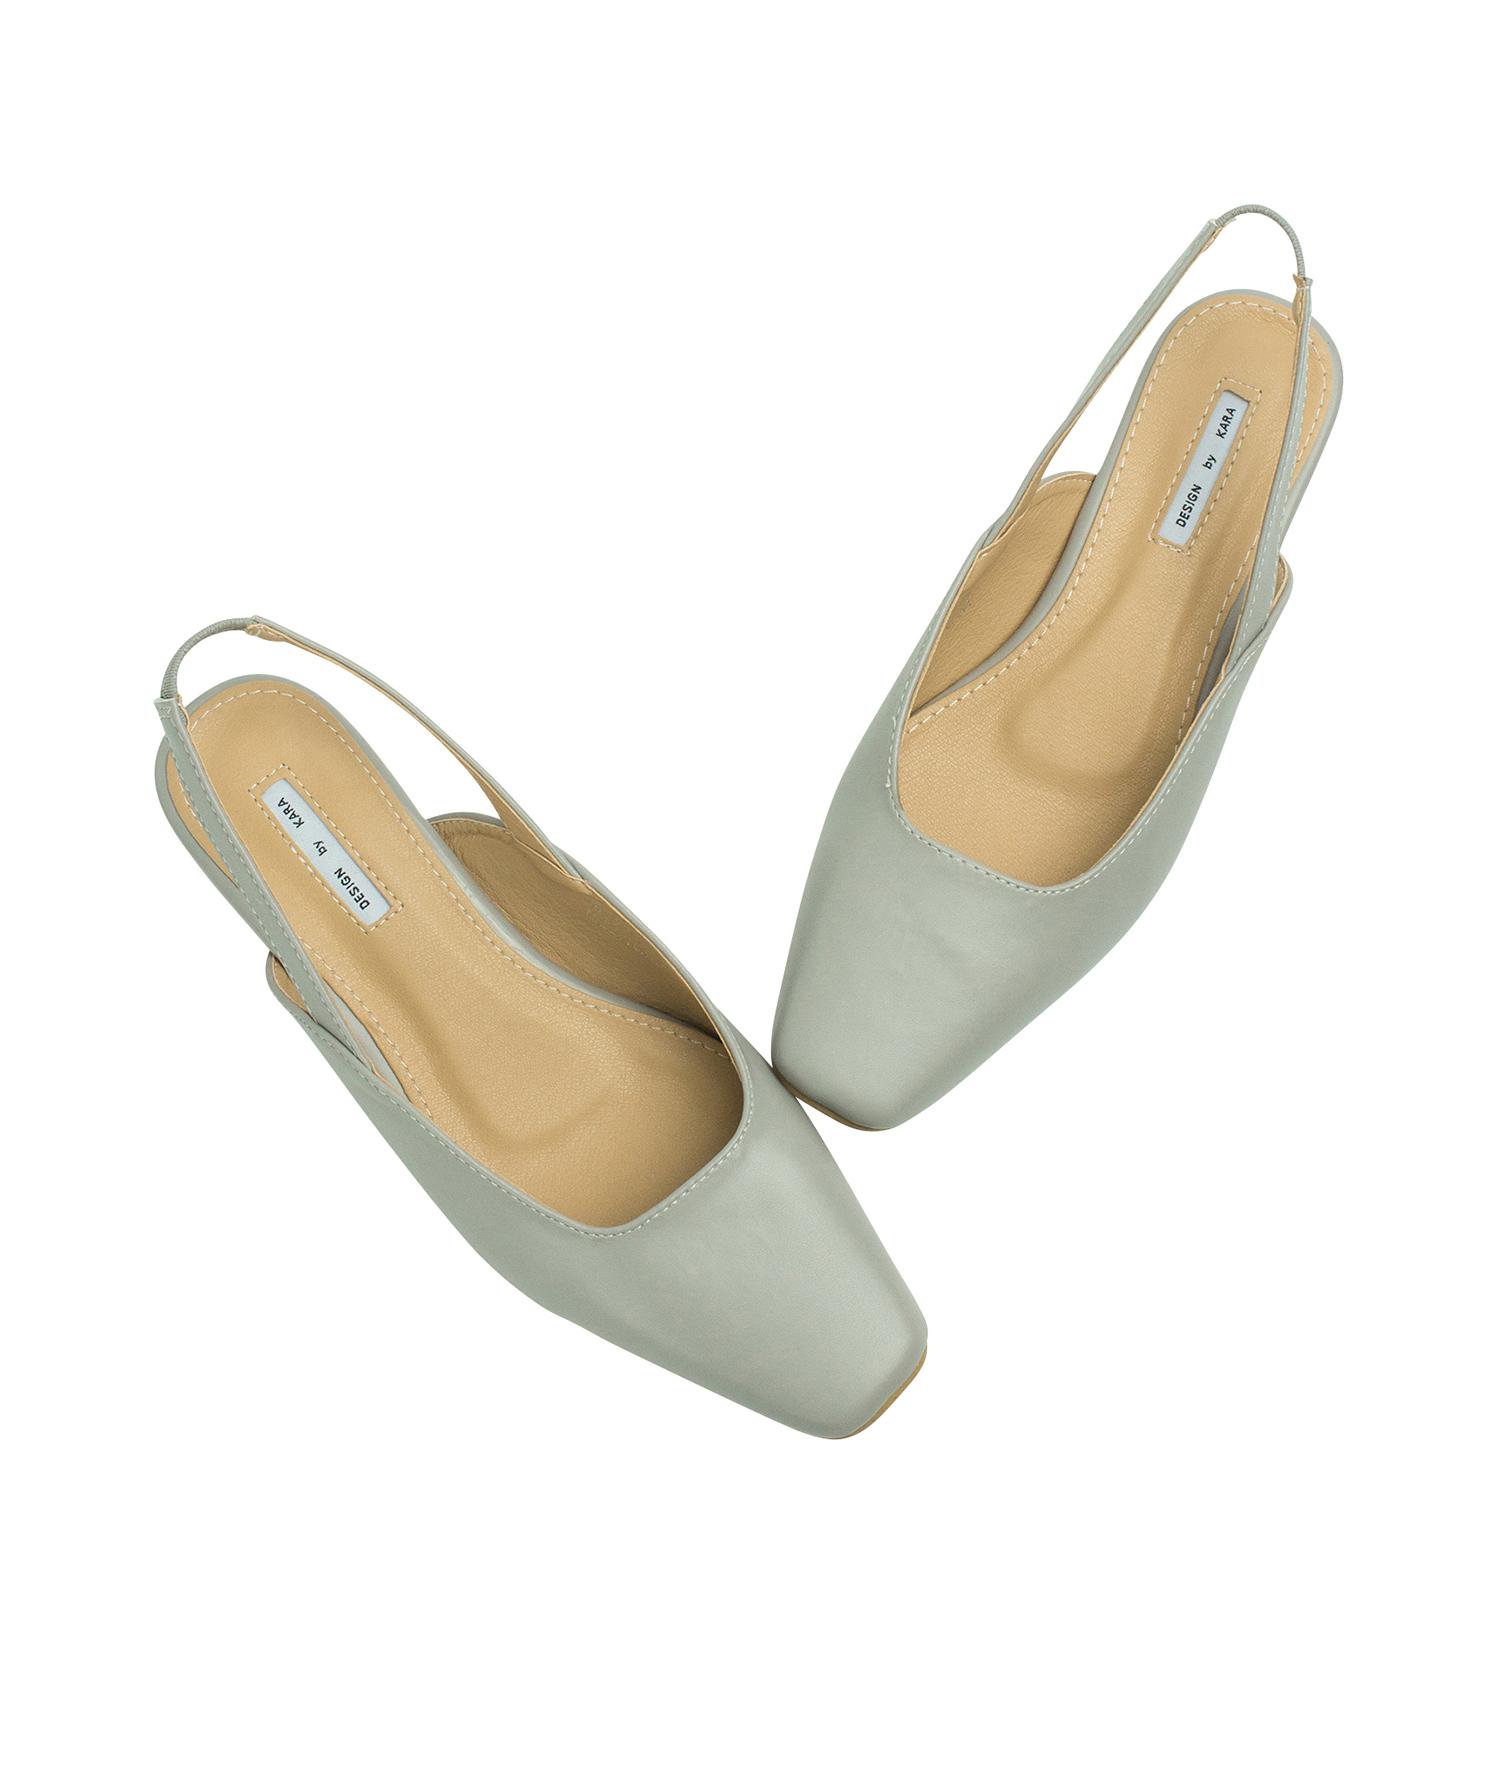 6a8abe66ed2 AnnaKastle Womens Square Toe Ballet Slingbacks Grey